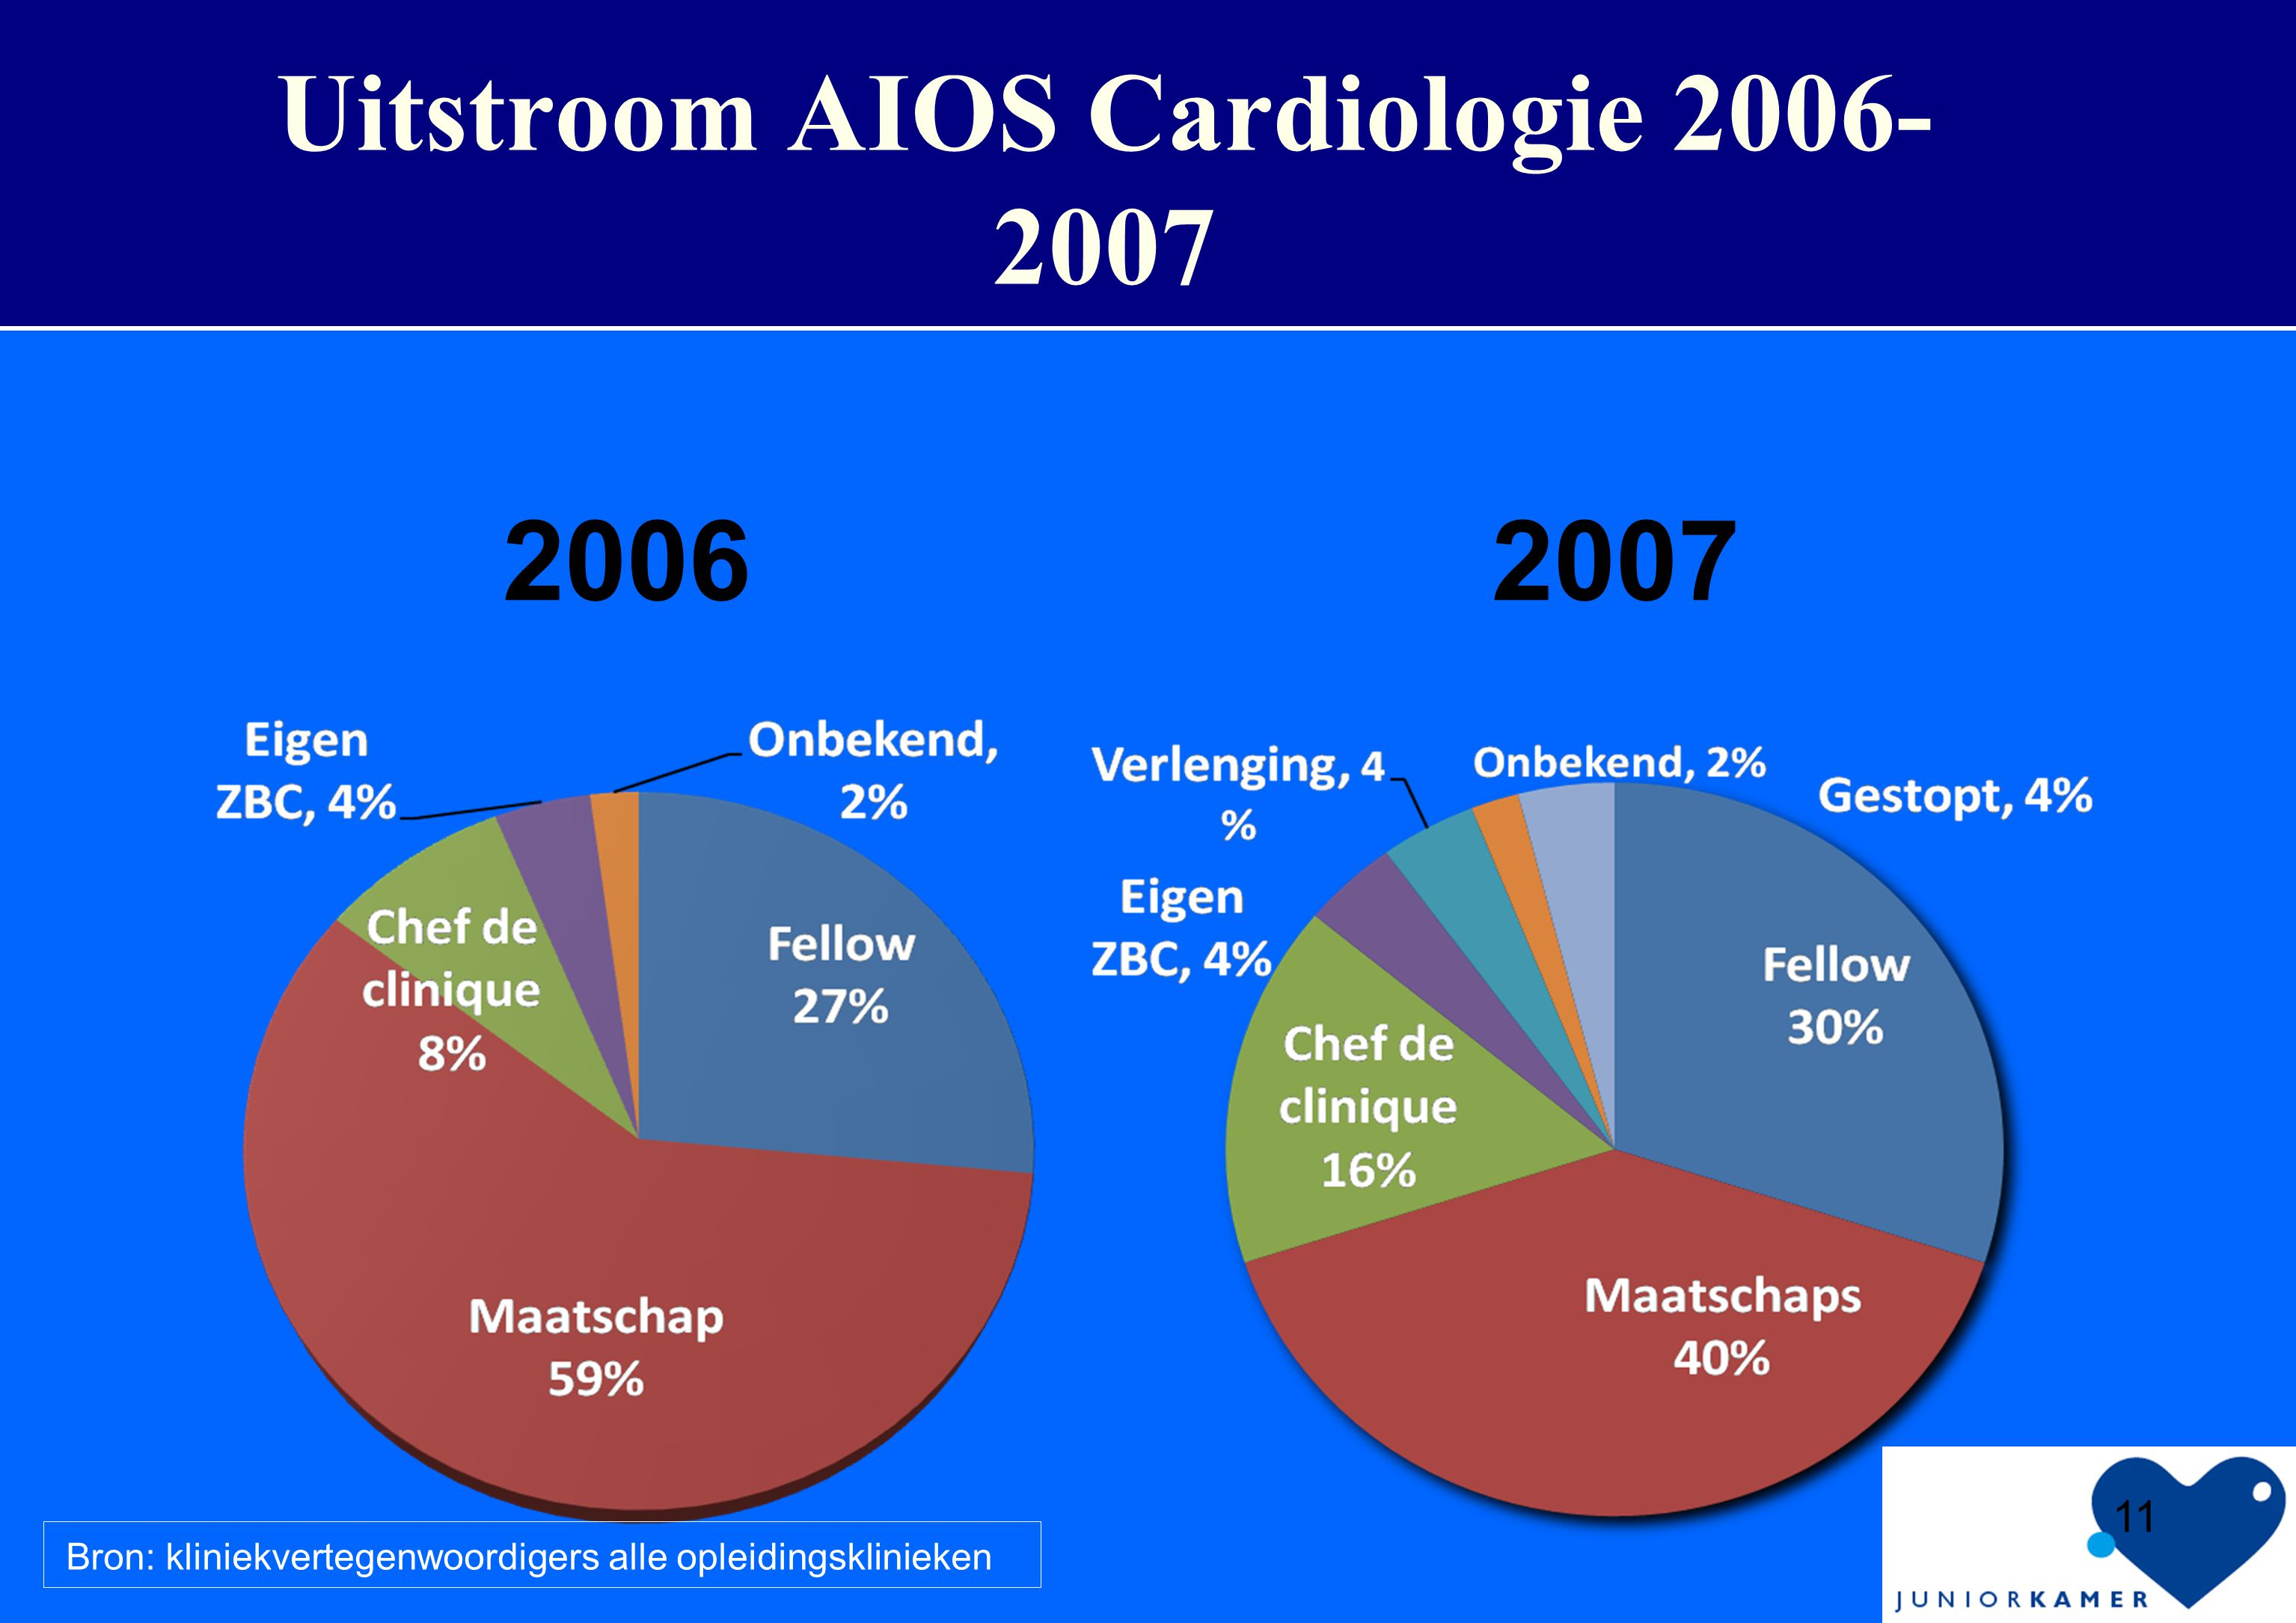 Uitstroom AIOS Cardiologie 2006-2007